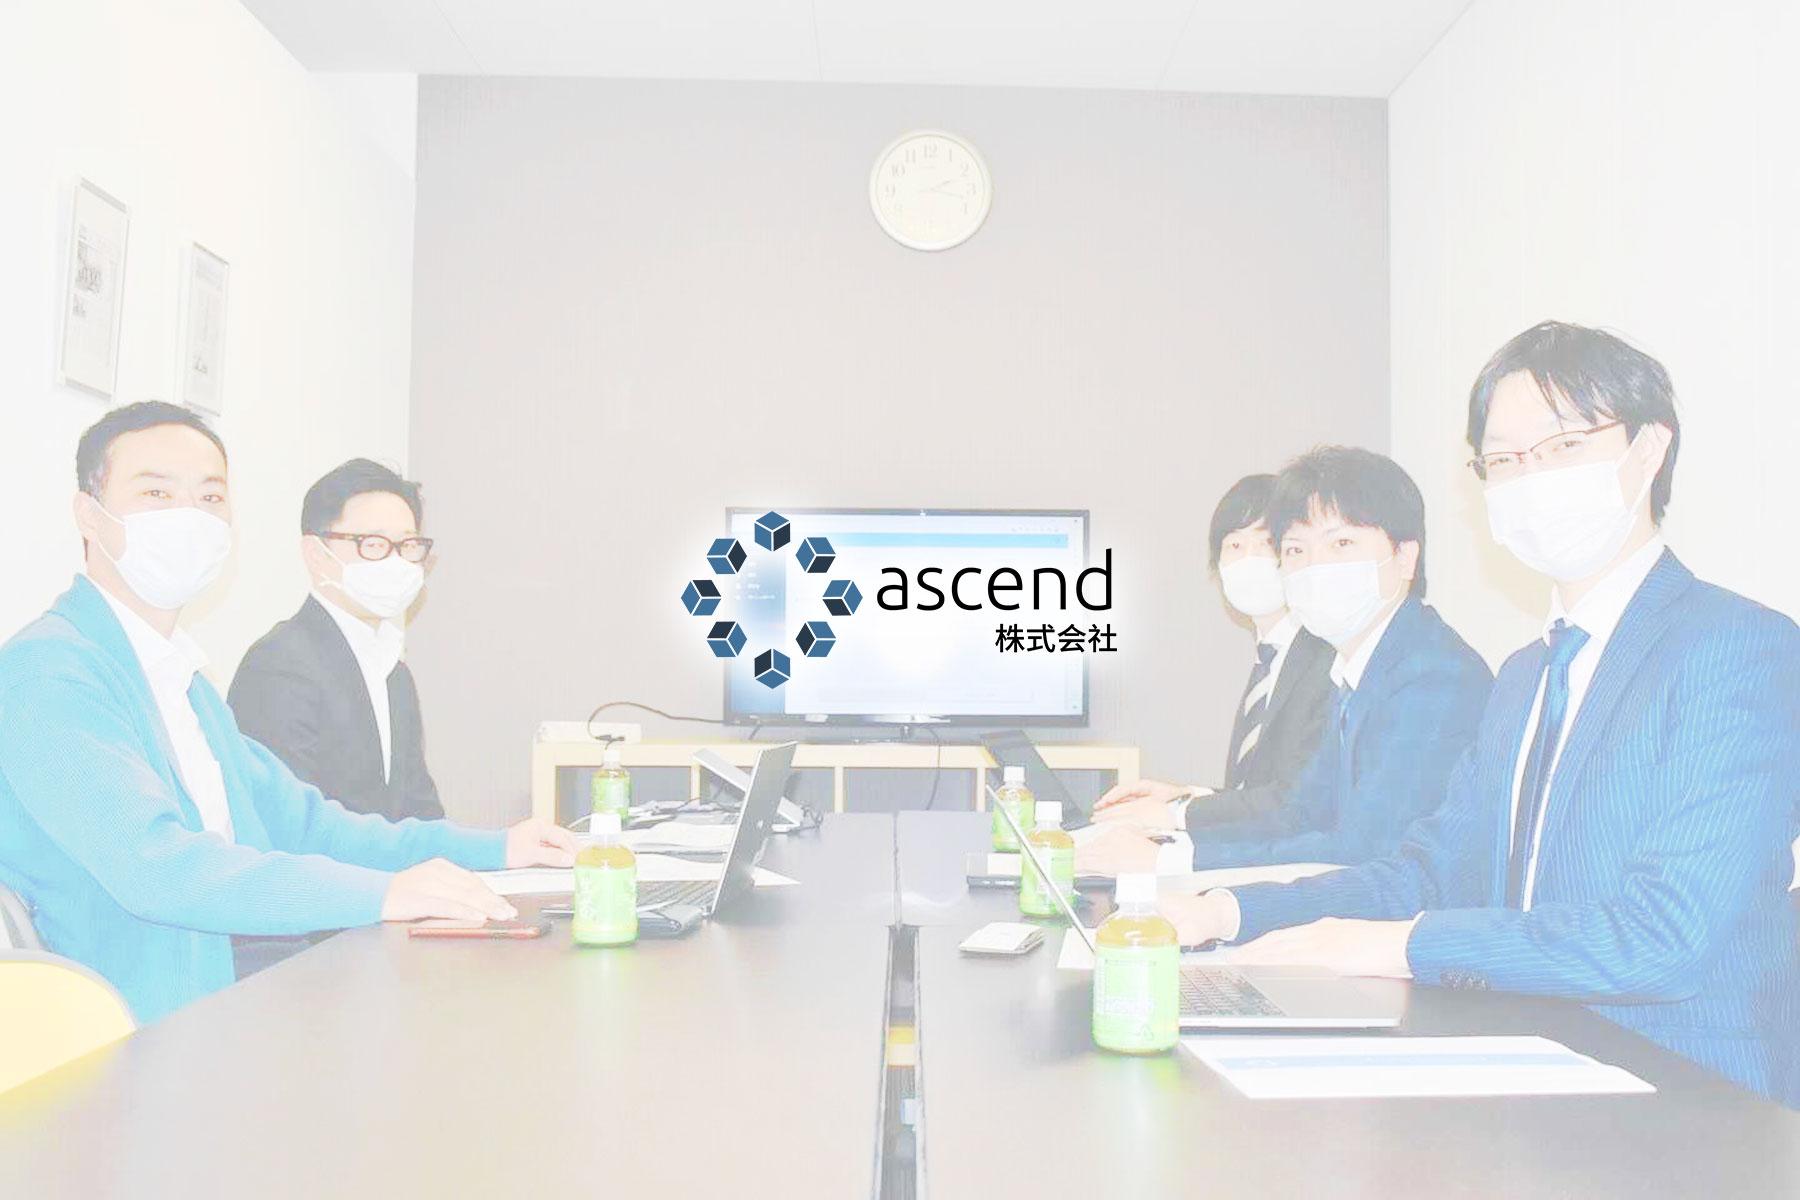 ascend株式会社のトップ画像